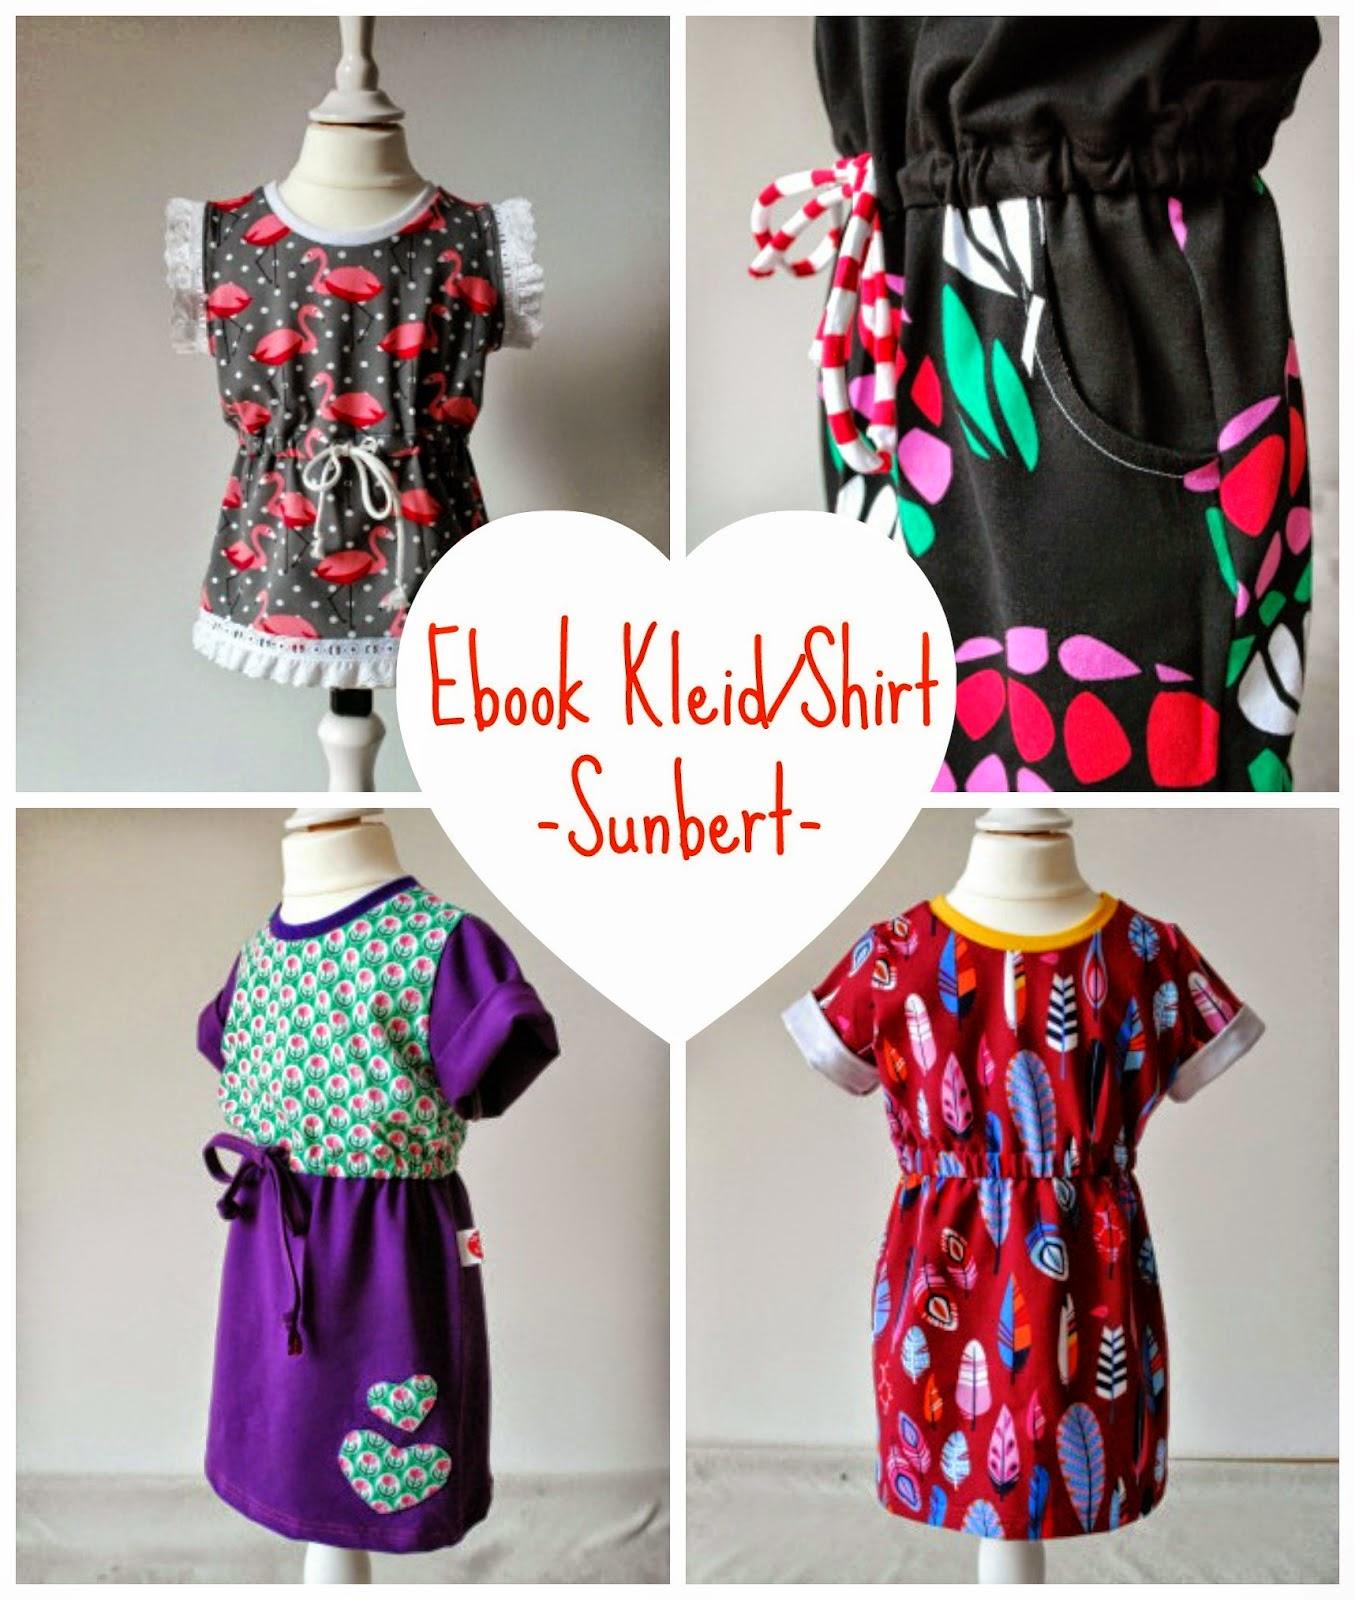 http://de.dawanda.com/product/64558475-Ebook-ShirtKleid-Sunbert